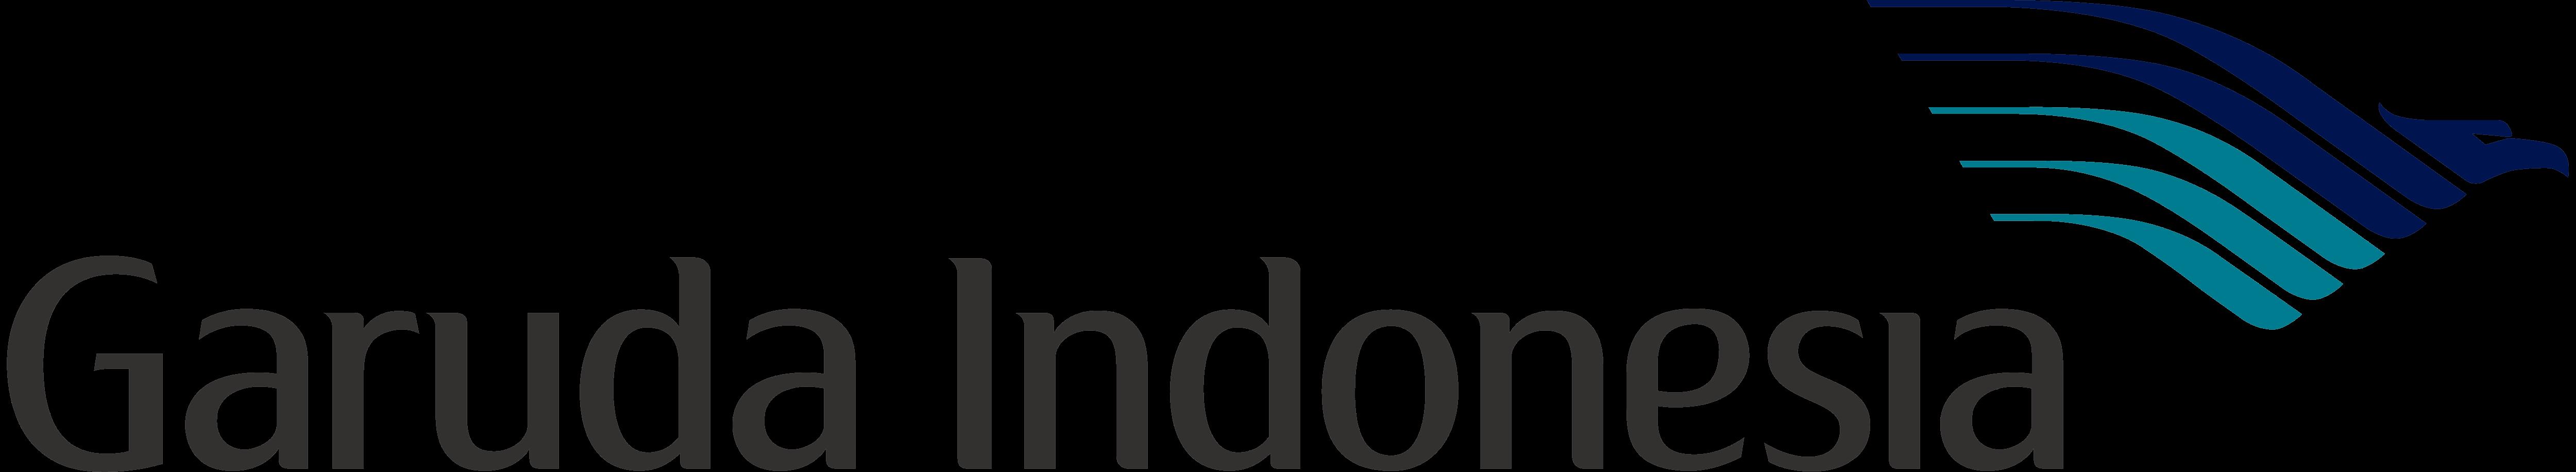 Garuda Indonesia logo, logotype